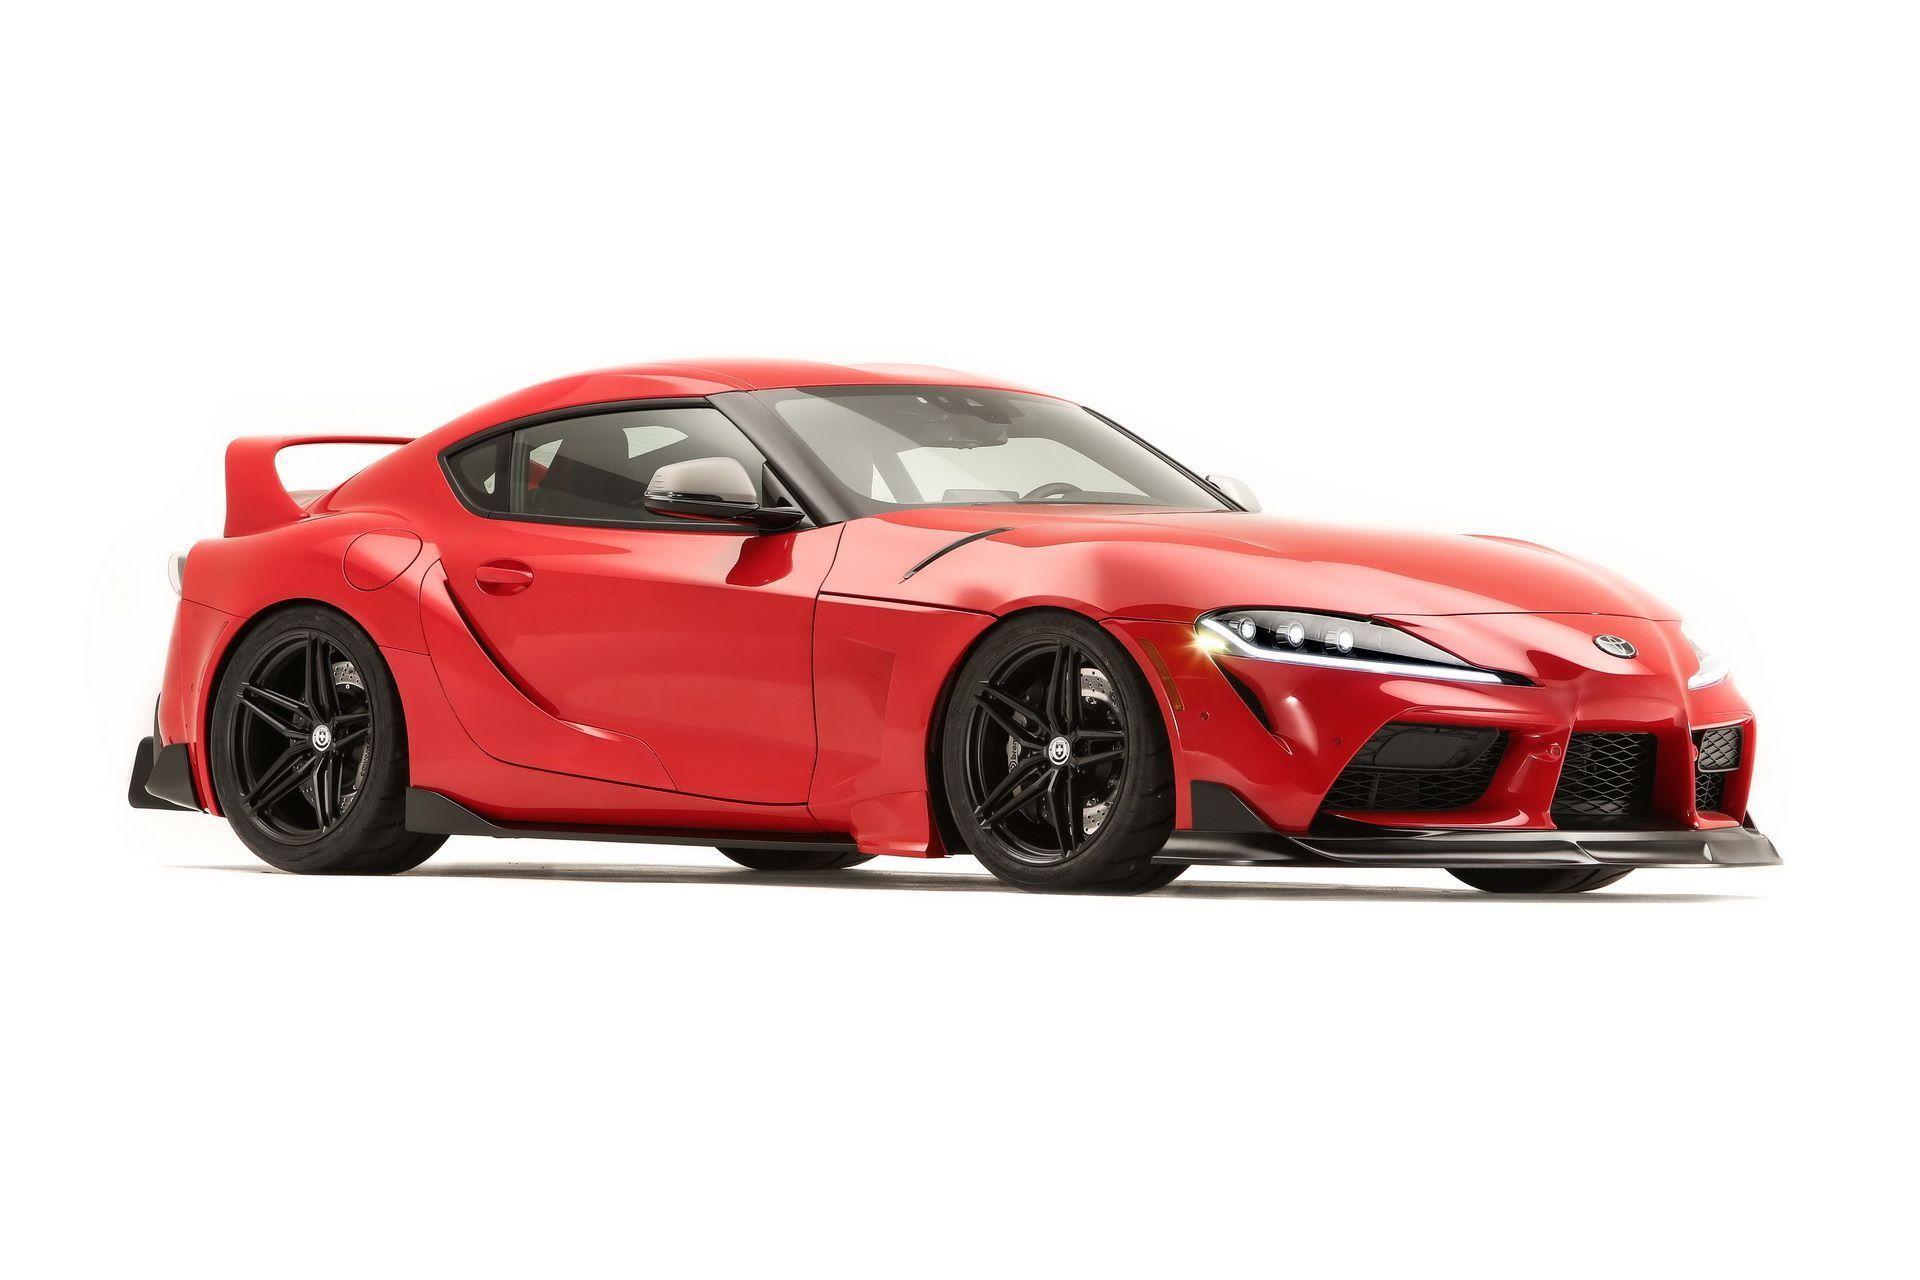 toyota-sema-2020-new-cars-27